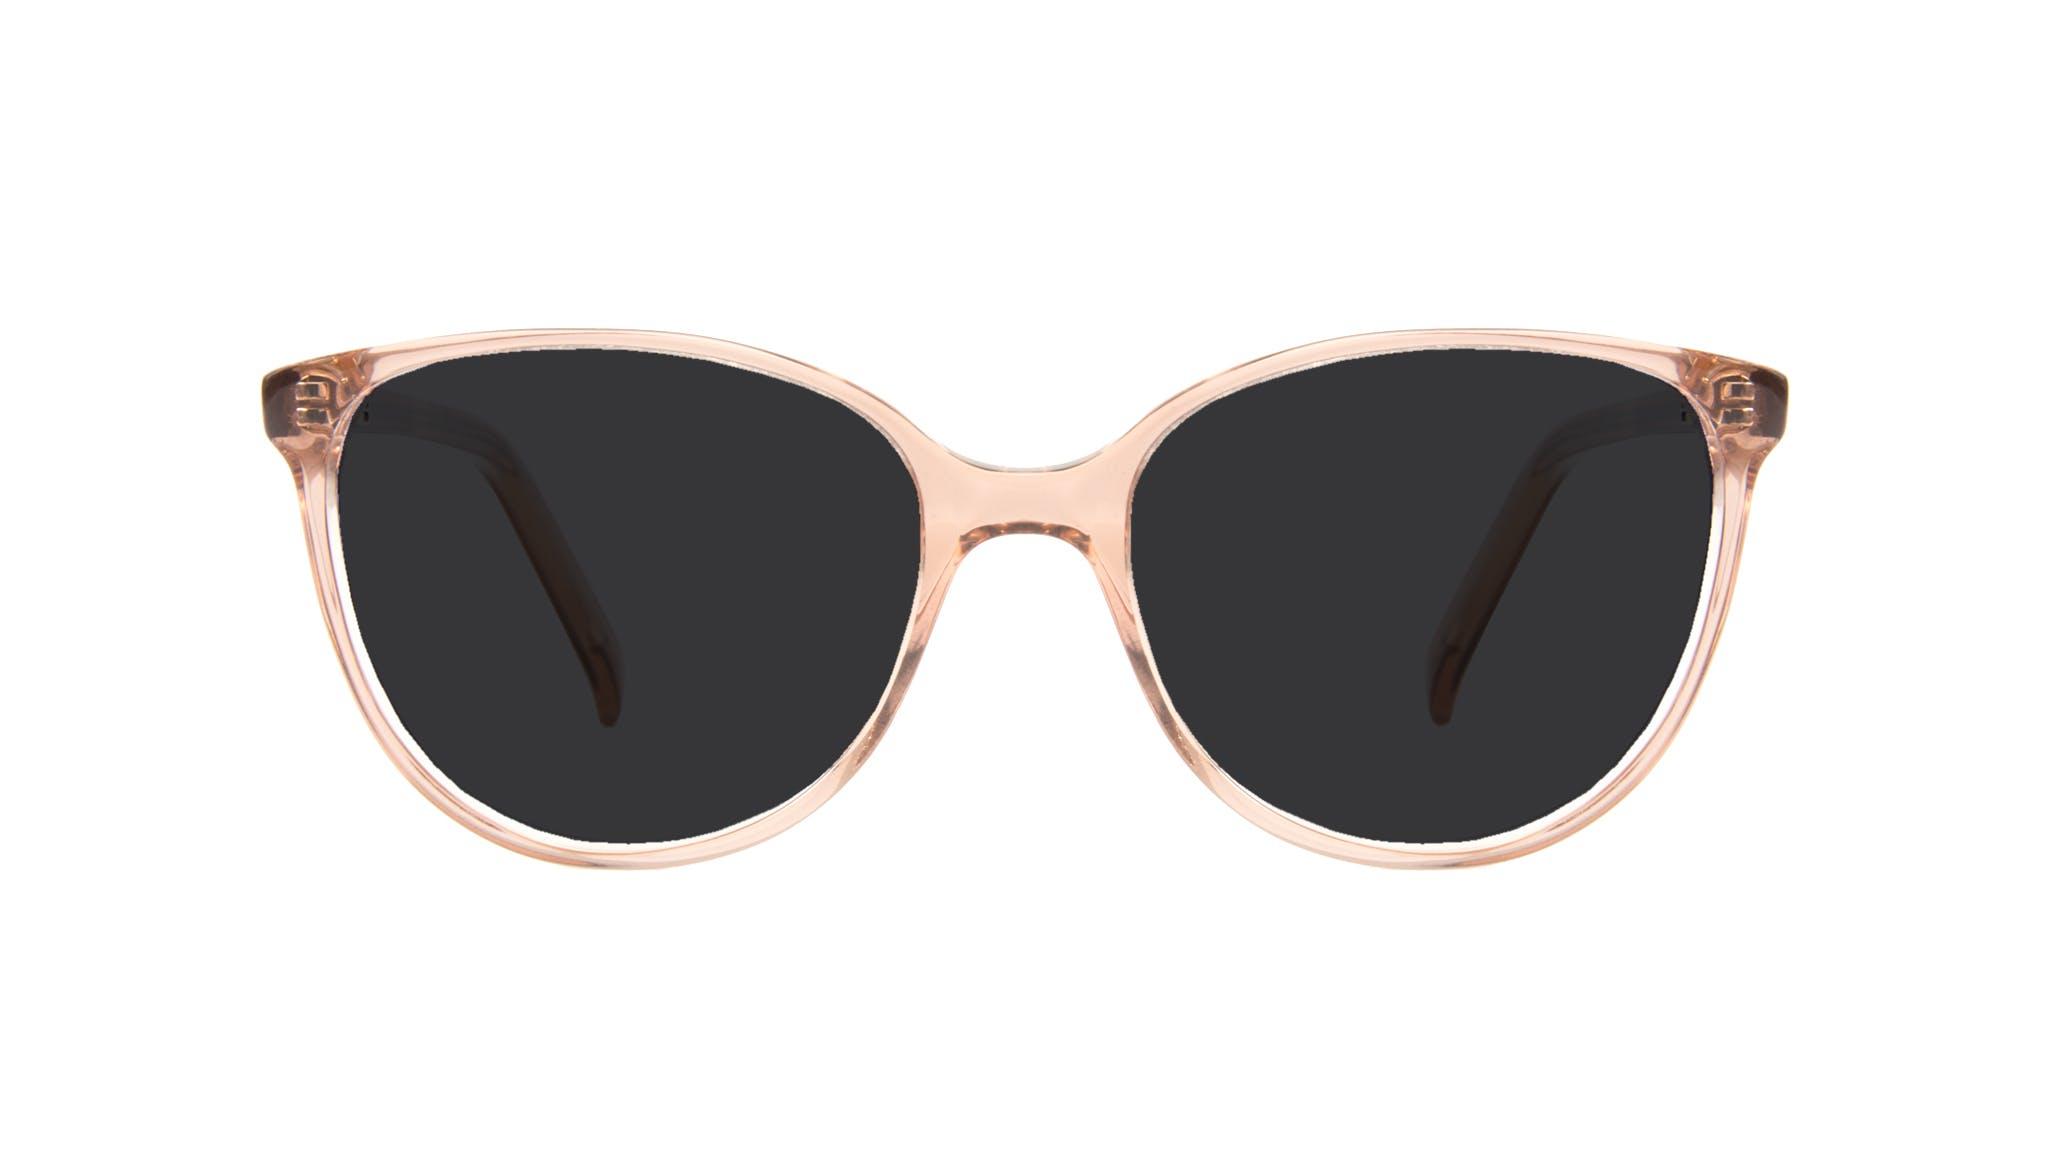 Affordable Fashion Glasses Round Sunglasses Women Imagine Petite Rose